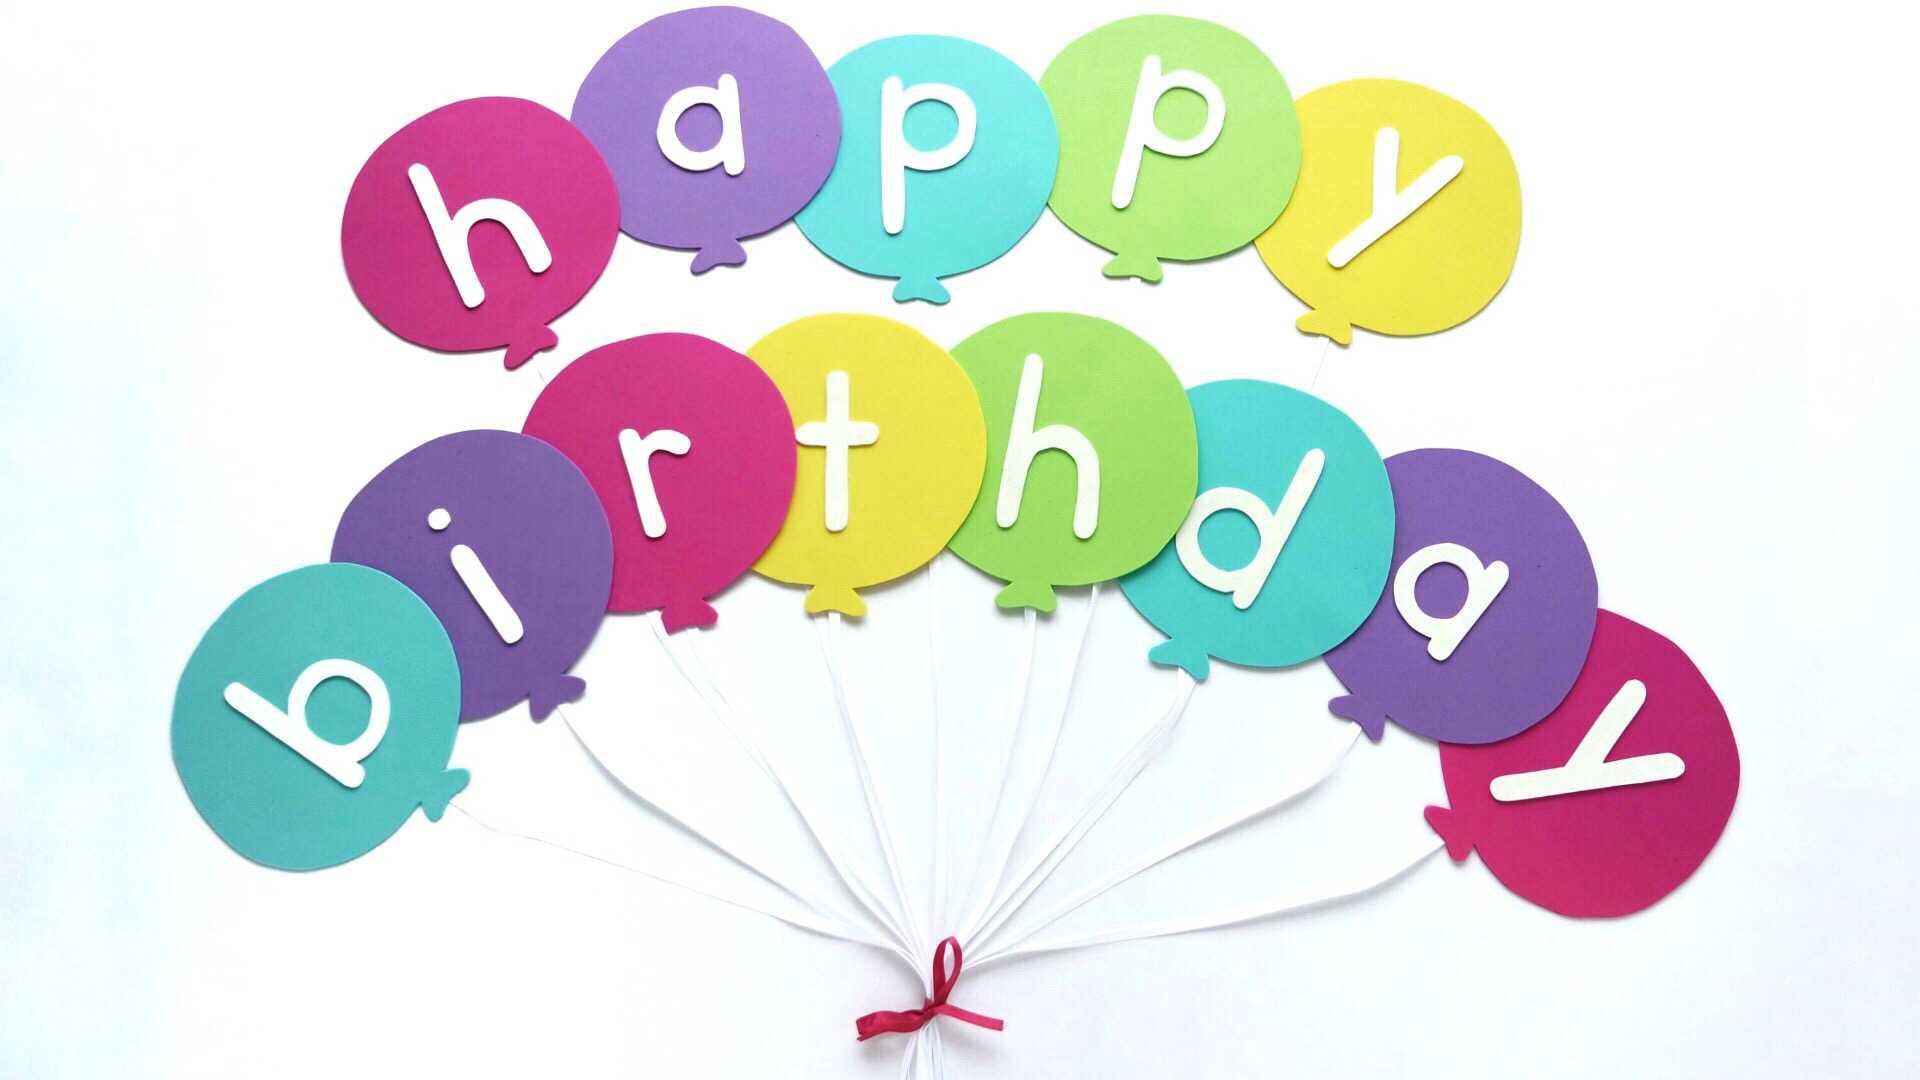 Happy Birthday Banner Diy Template   Balloon Birthday Banner Within Diy Birthday Banner Template